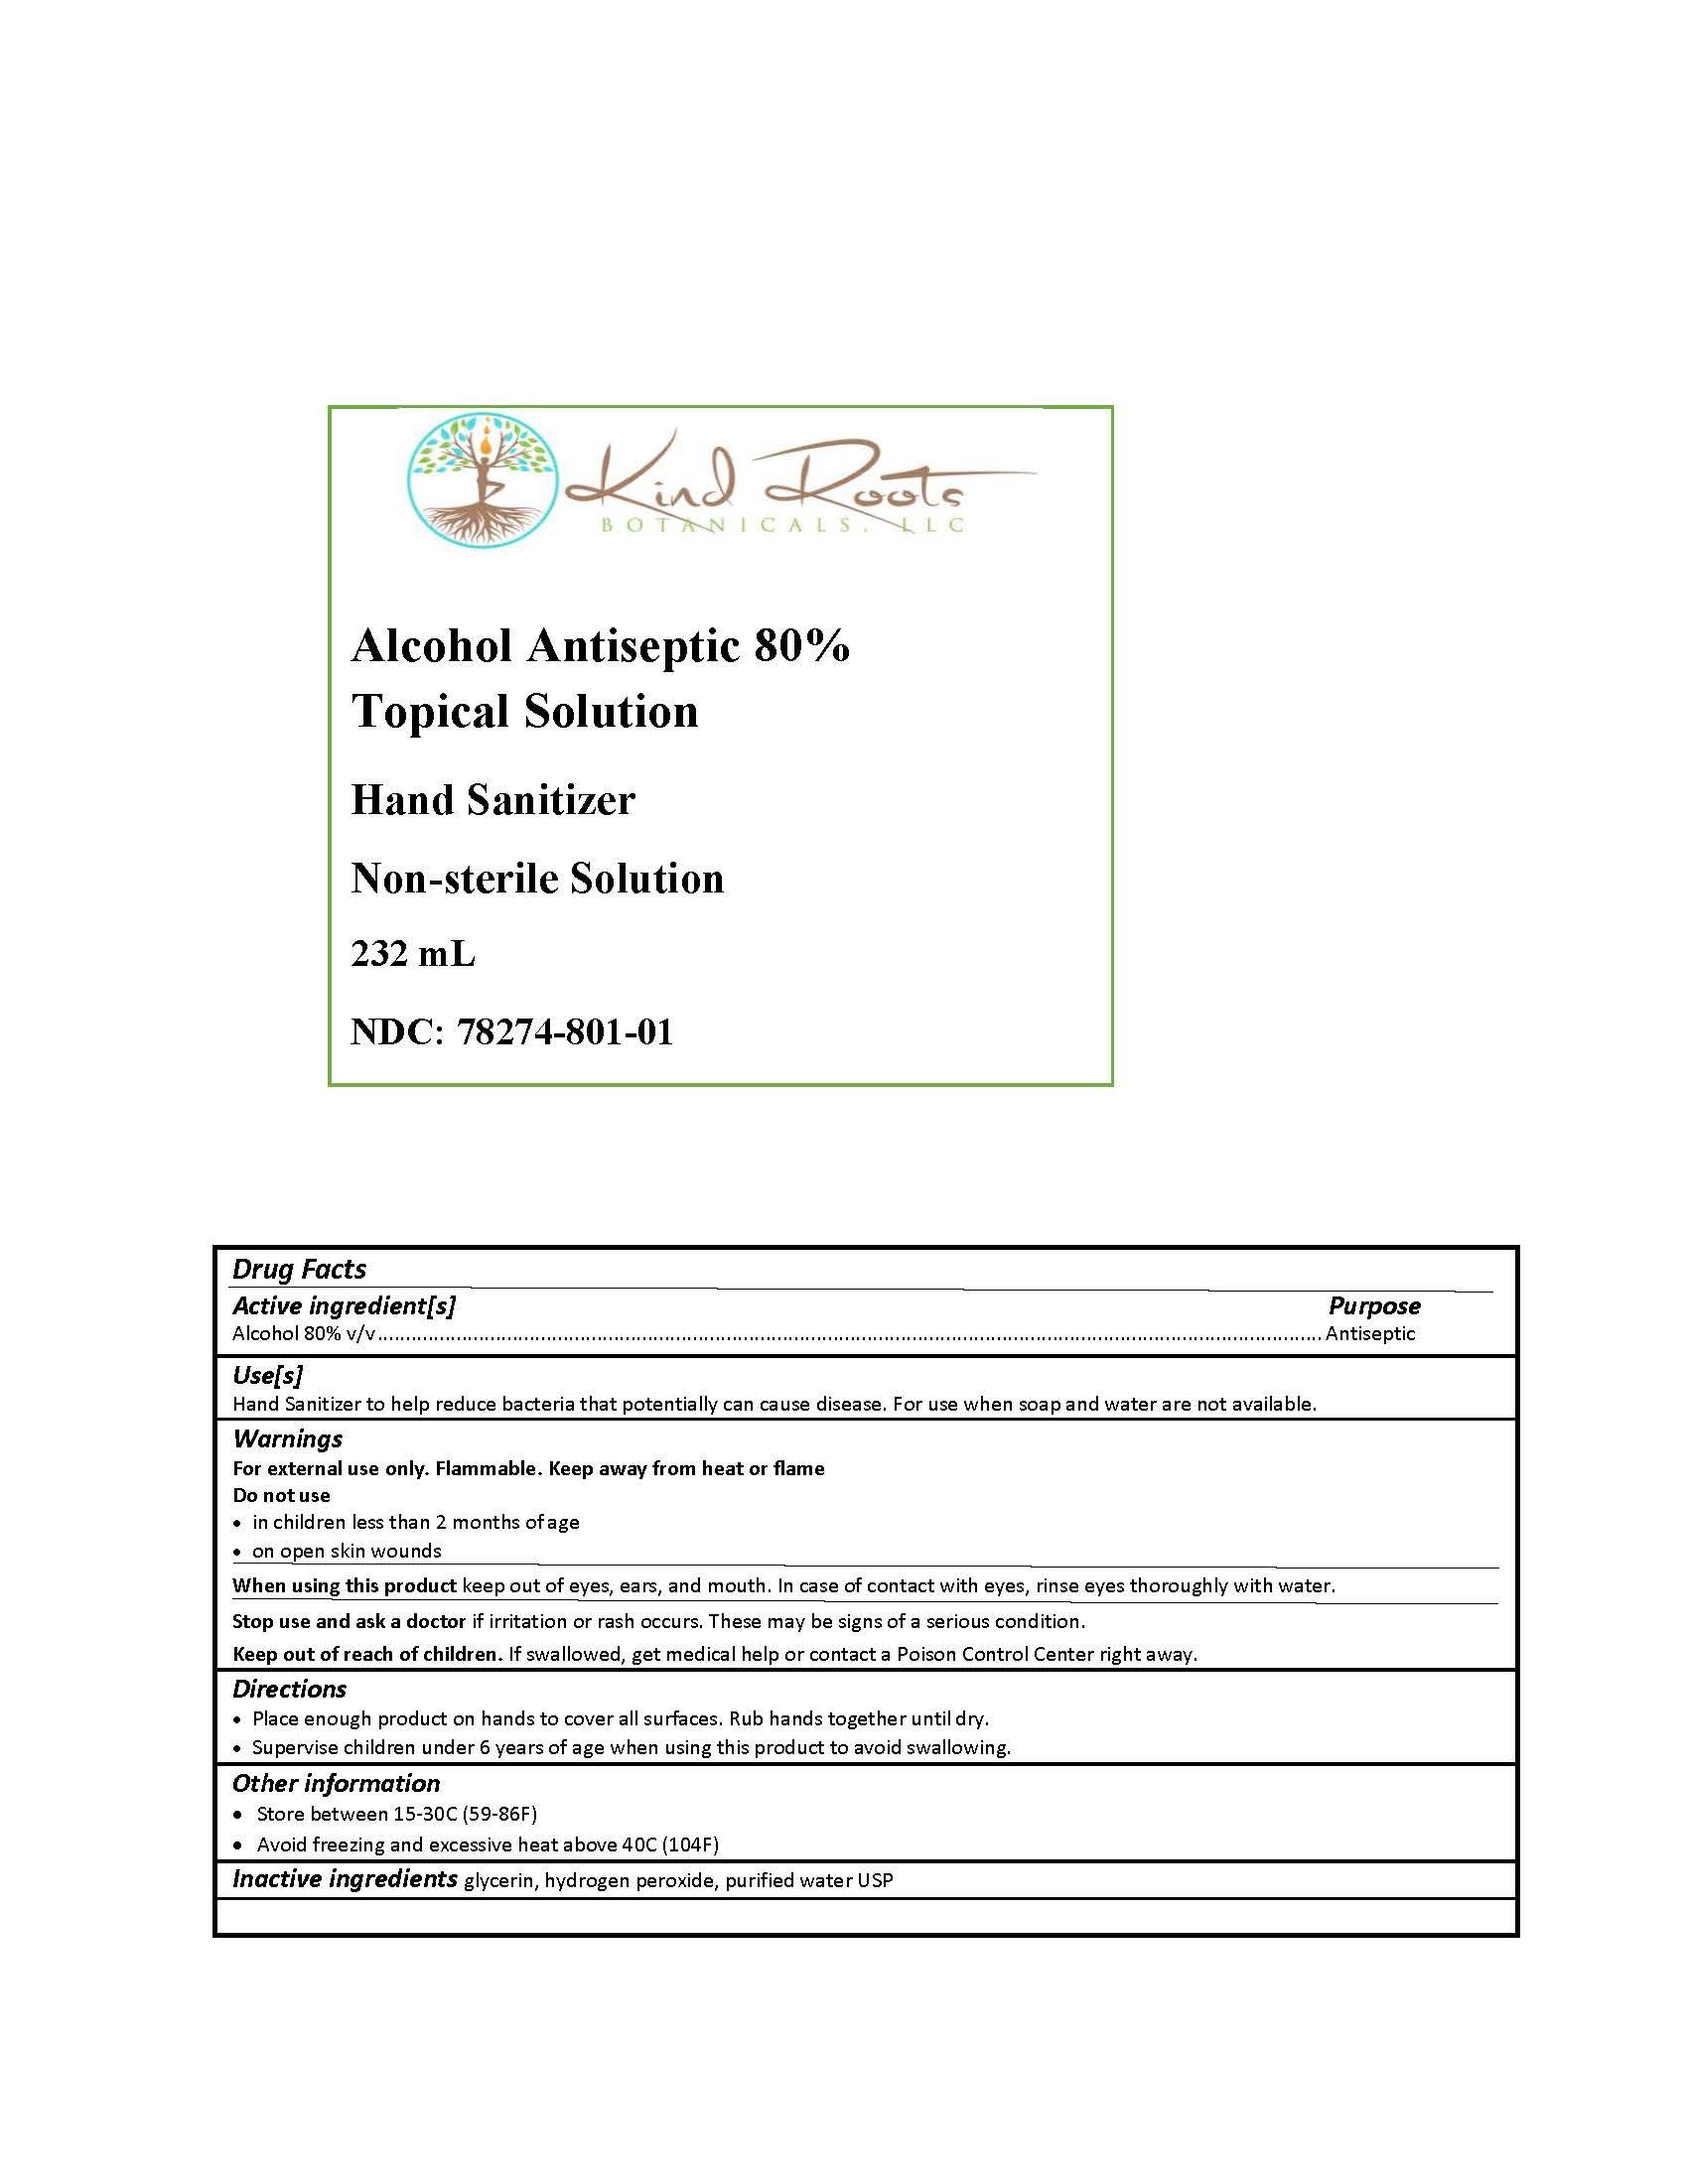 232 ml label